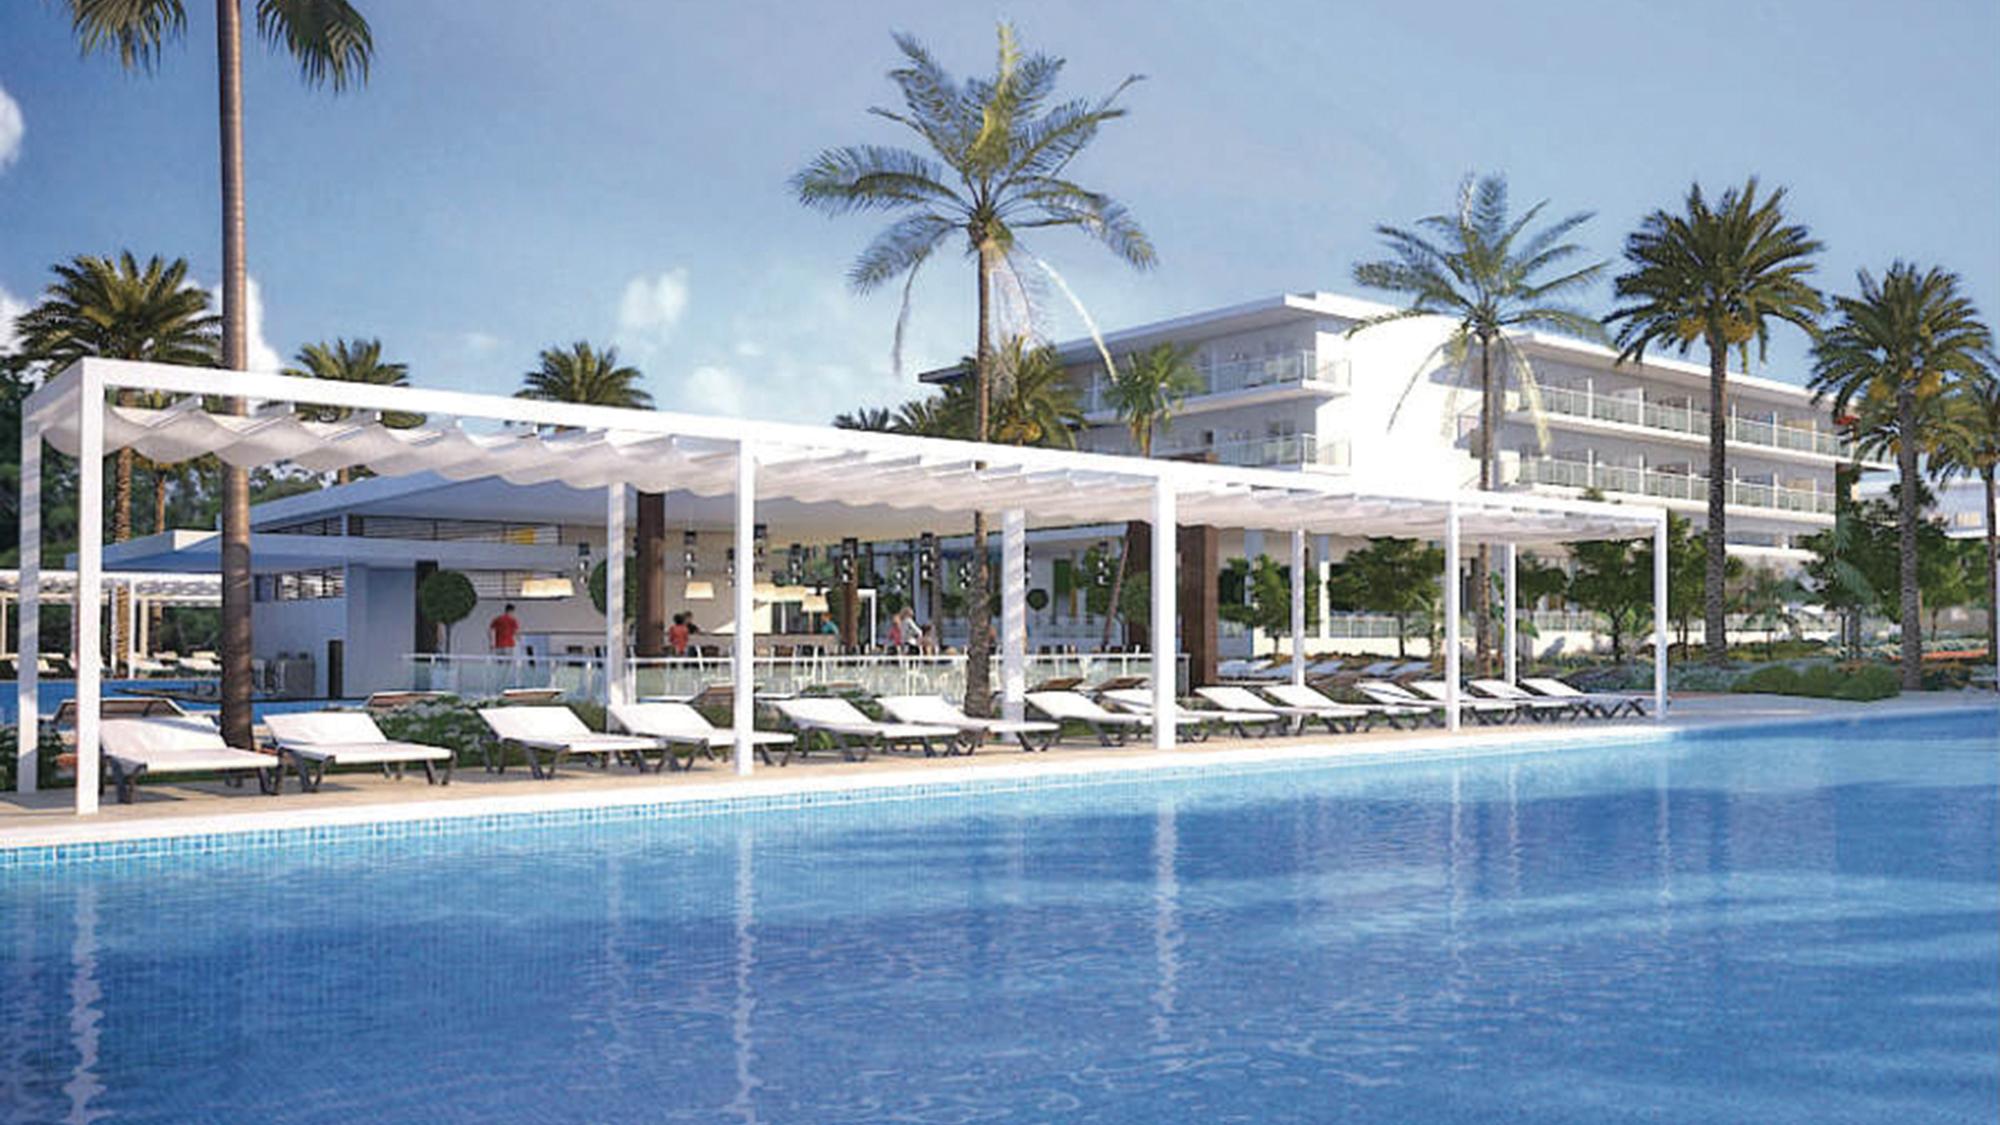 Riu Playacar Renovations : Riu playacar debuts new look travel weekly